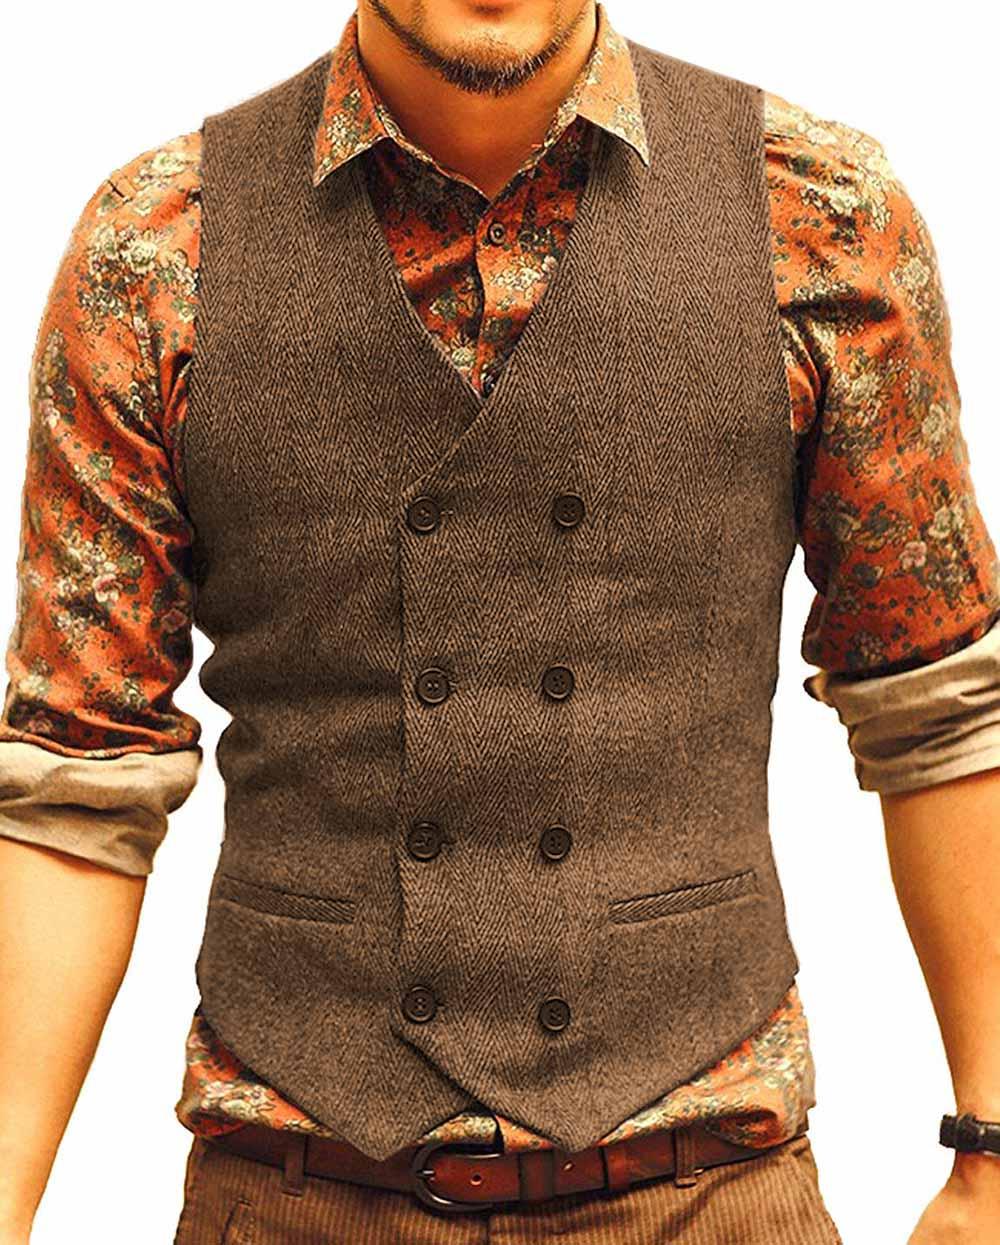 Mens Suit Vest V Neck Wool Herringbone Casual Formal Business Double-breasted Waistcoat Groomman For Wedding Green/Black/Brown